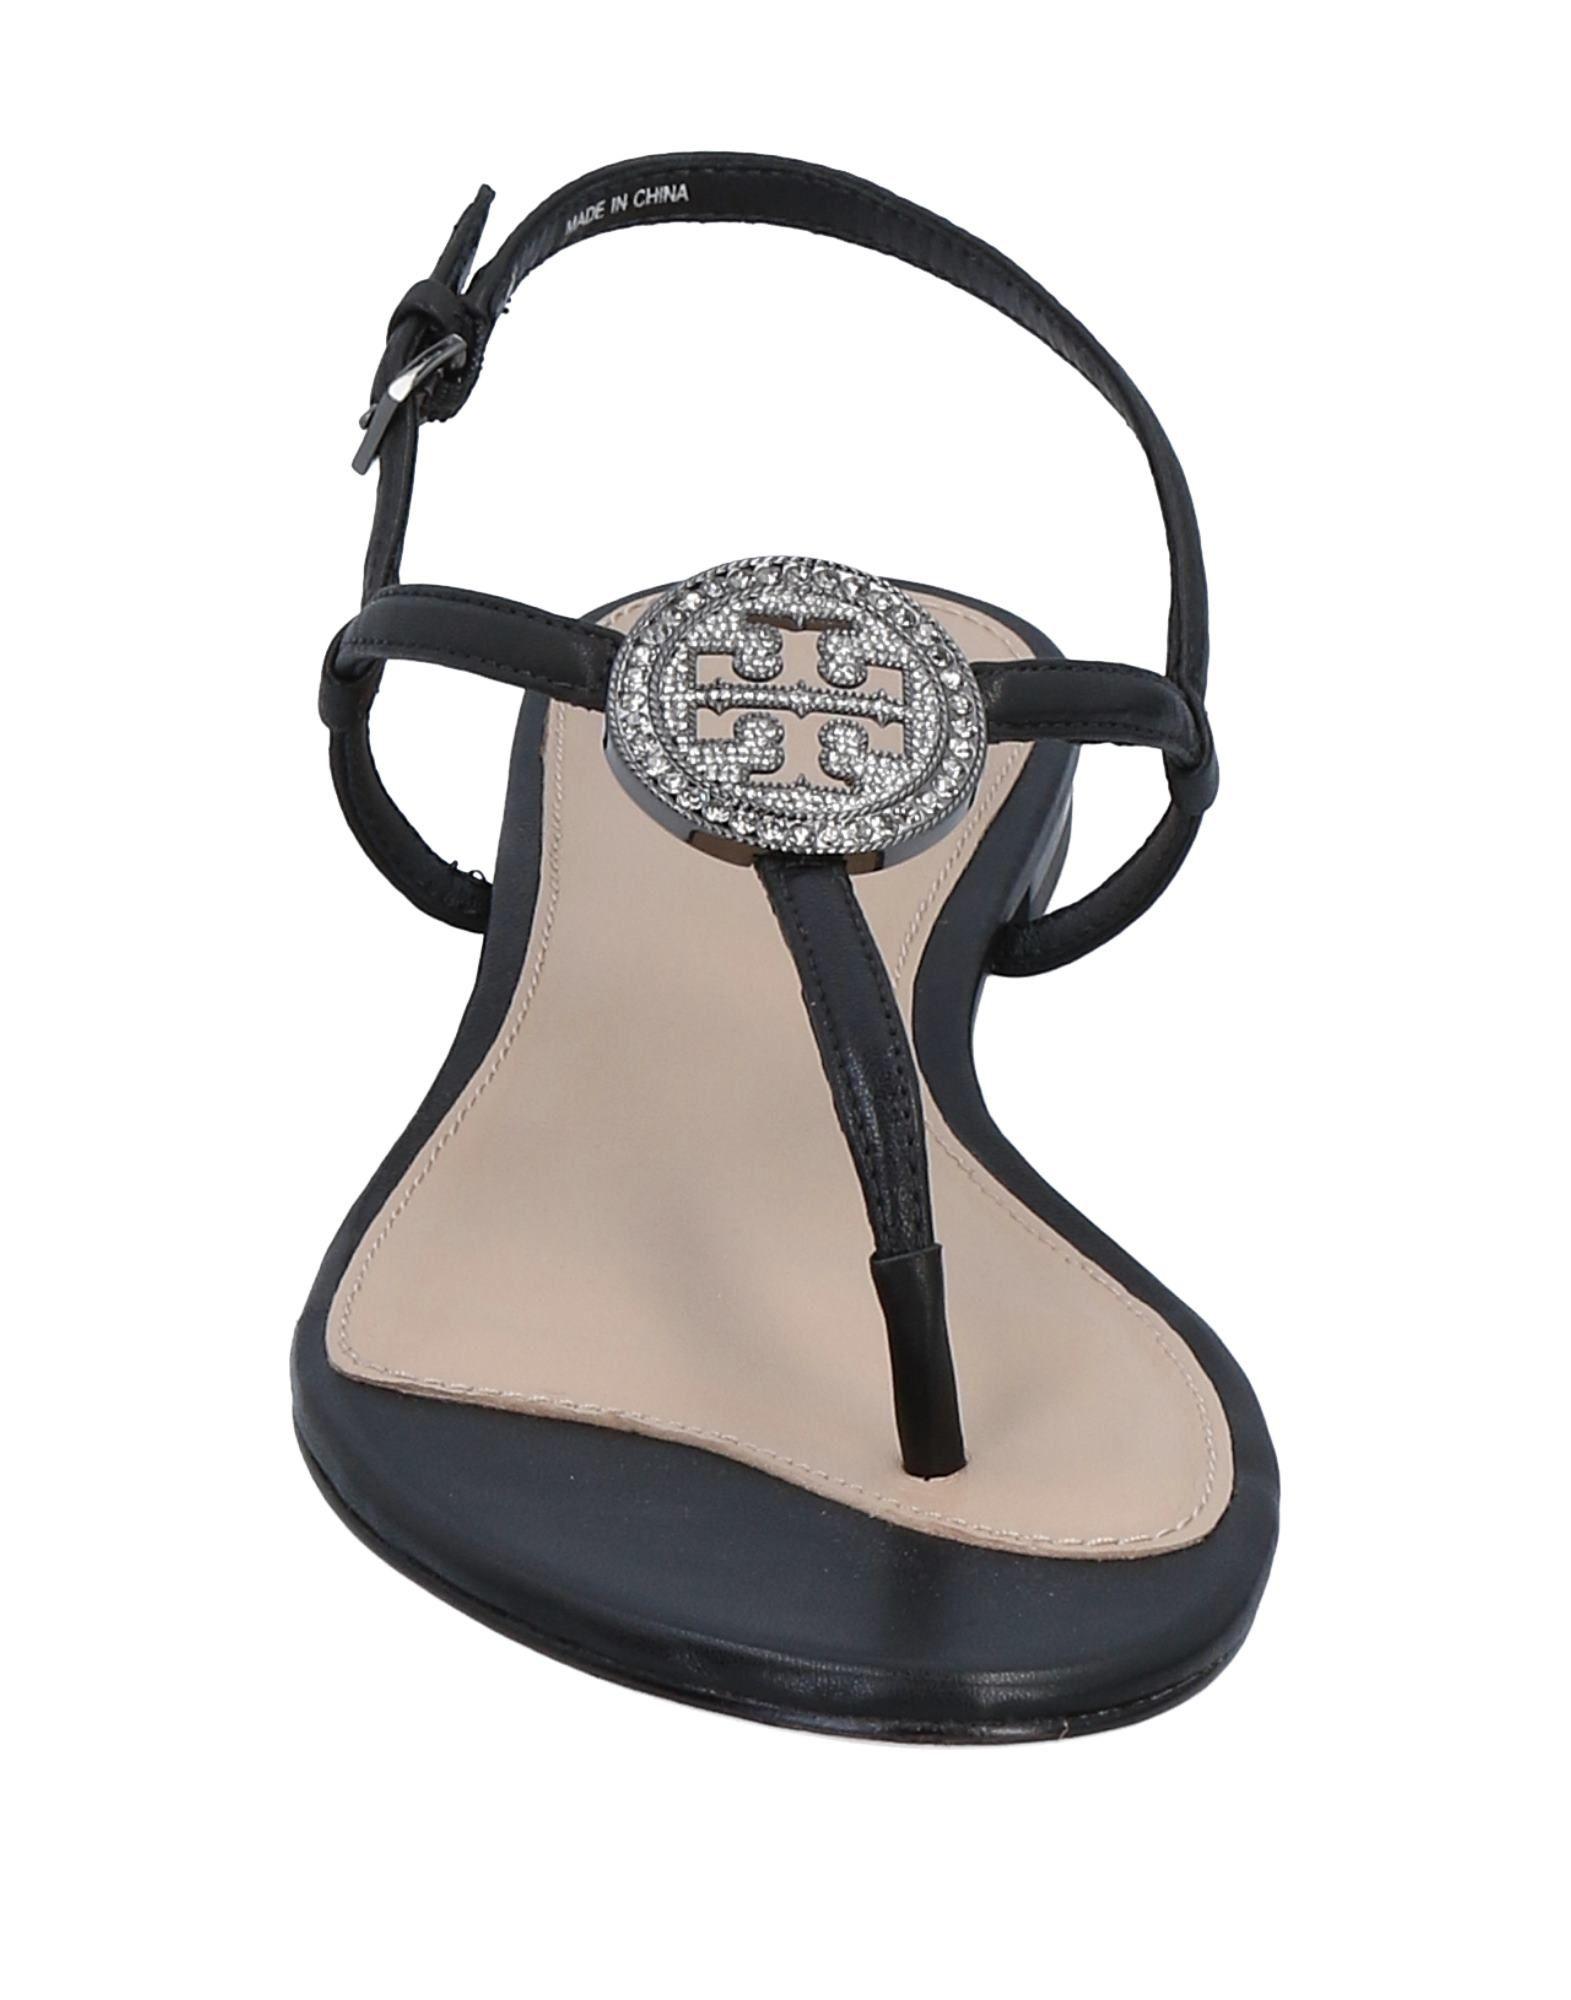 Stilvolle billige Schuhe Tory Burch Dianetten Dianetten Dianetten Damen  11534753PW aafef6